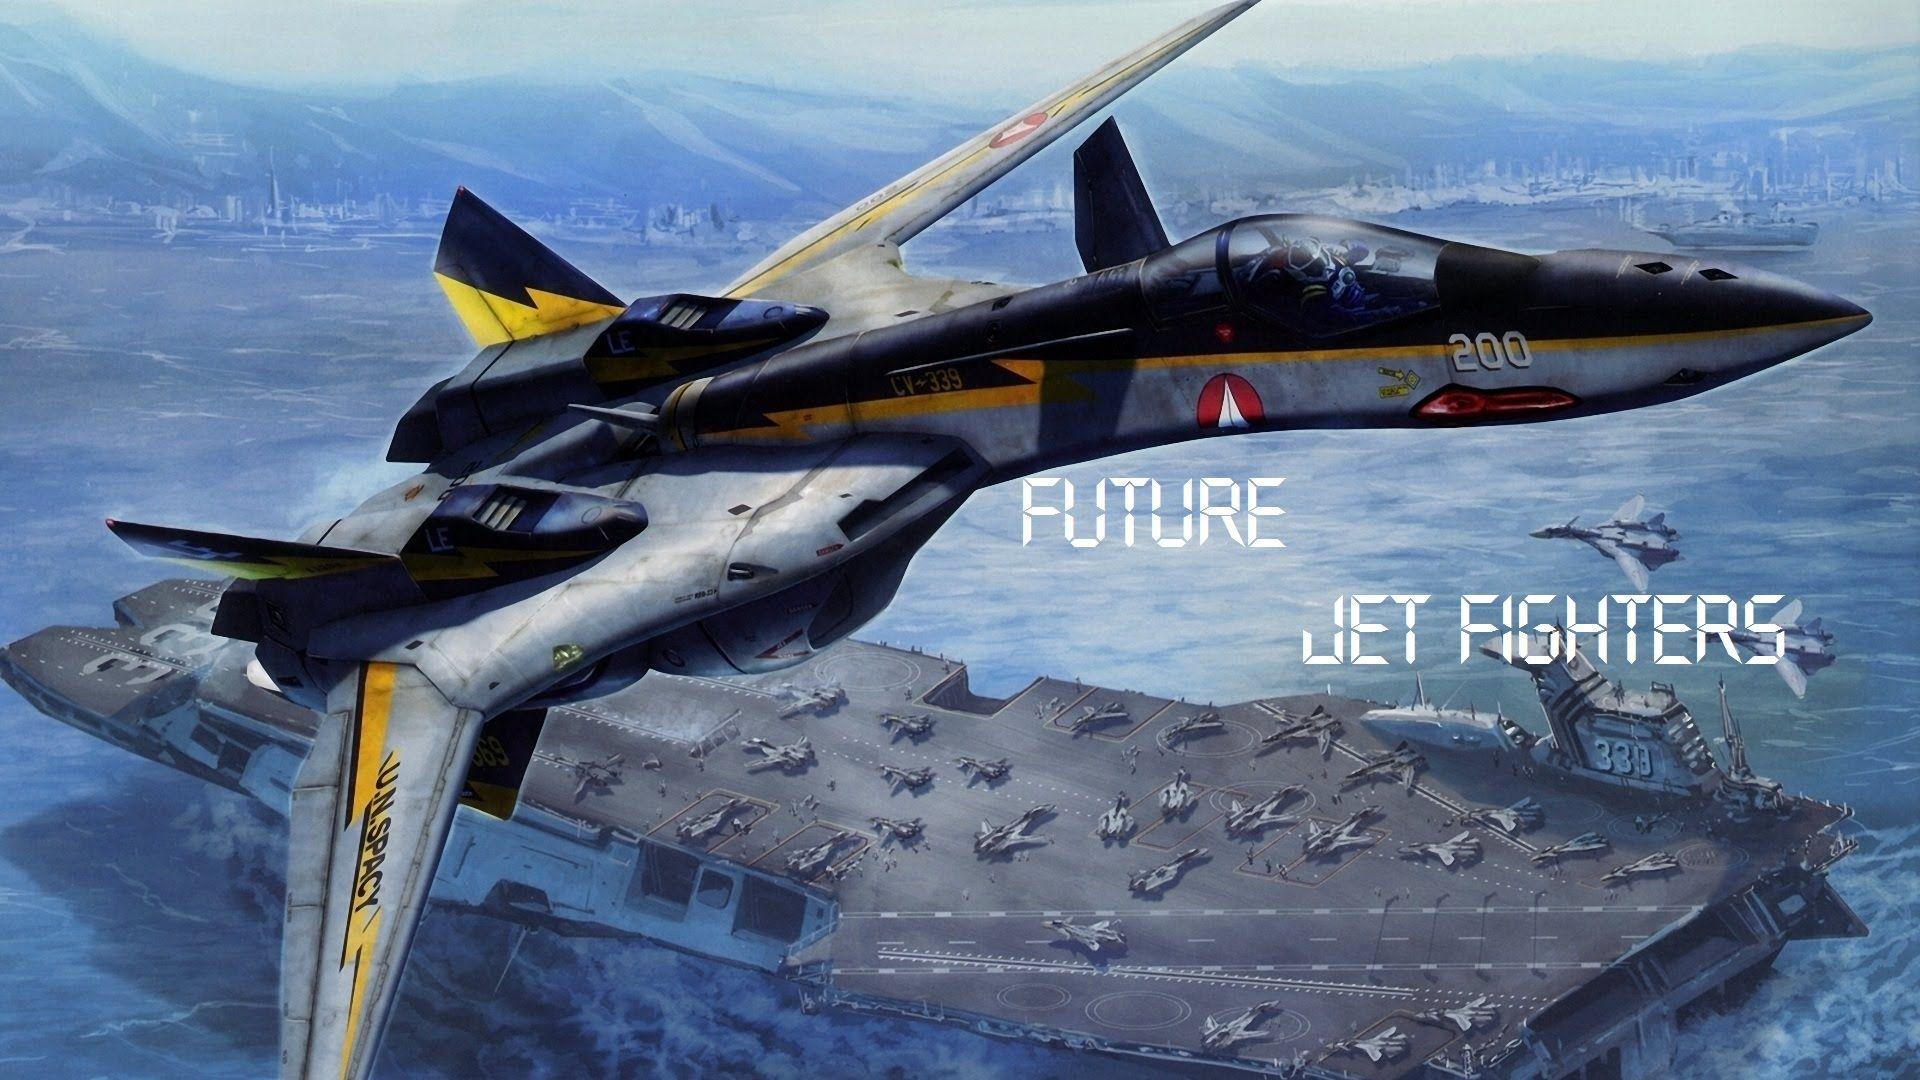 Discovery HD - Future ...